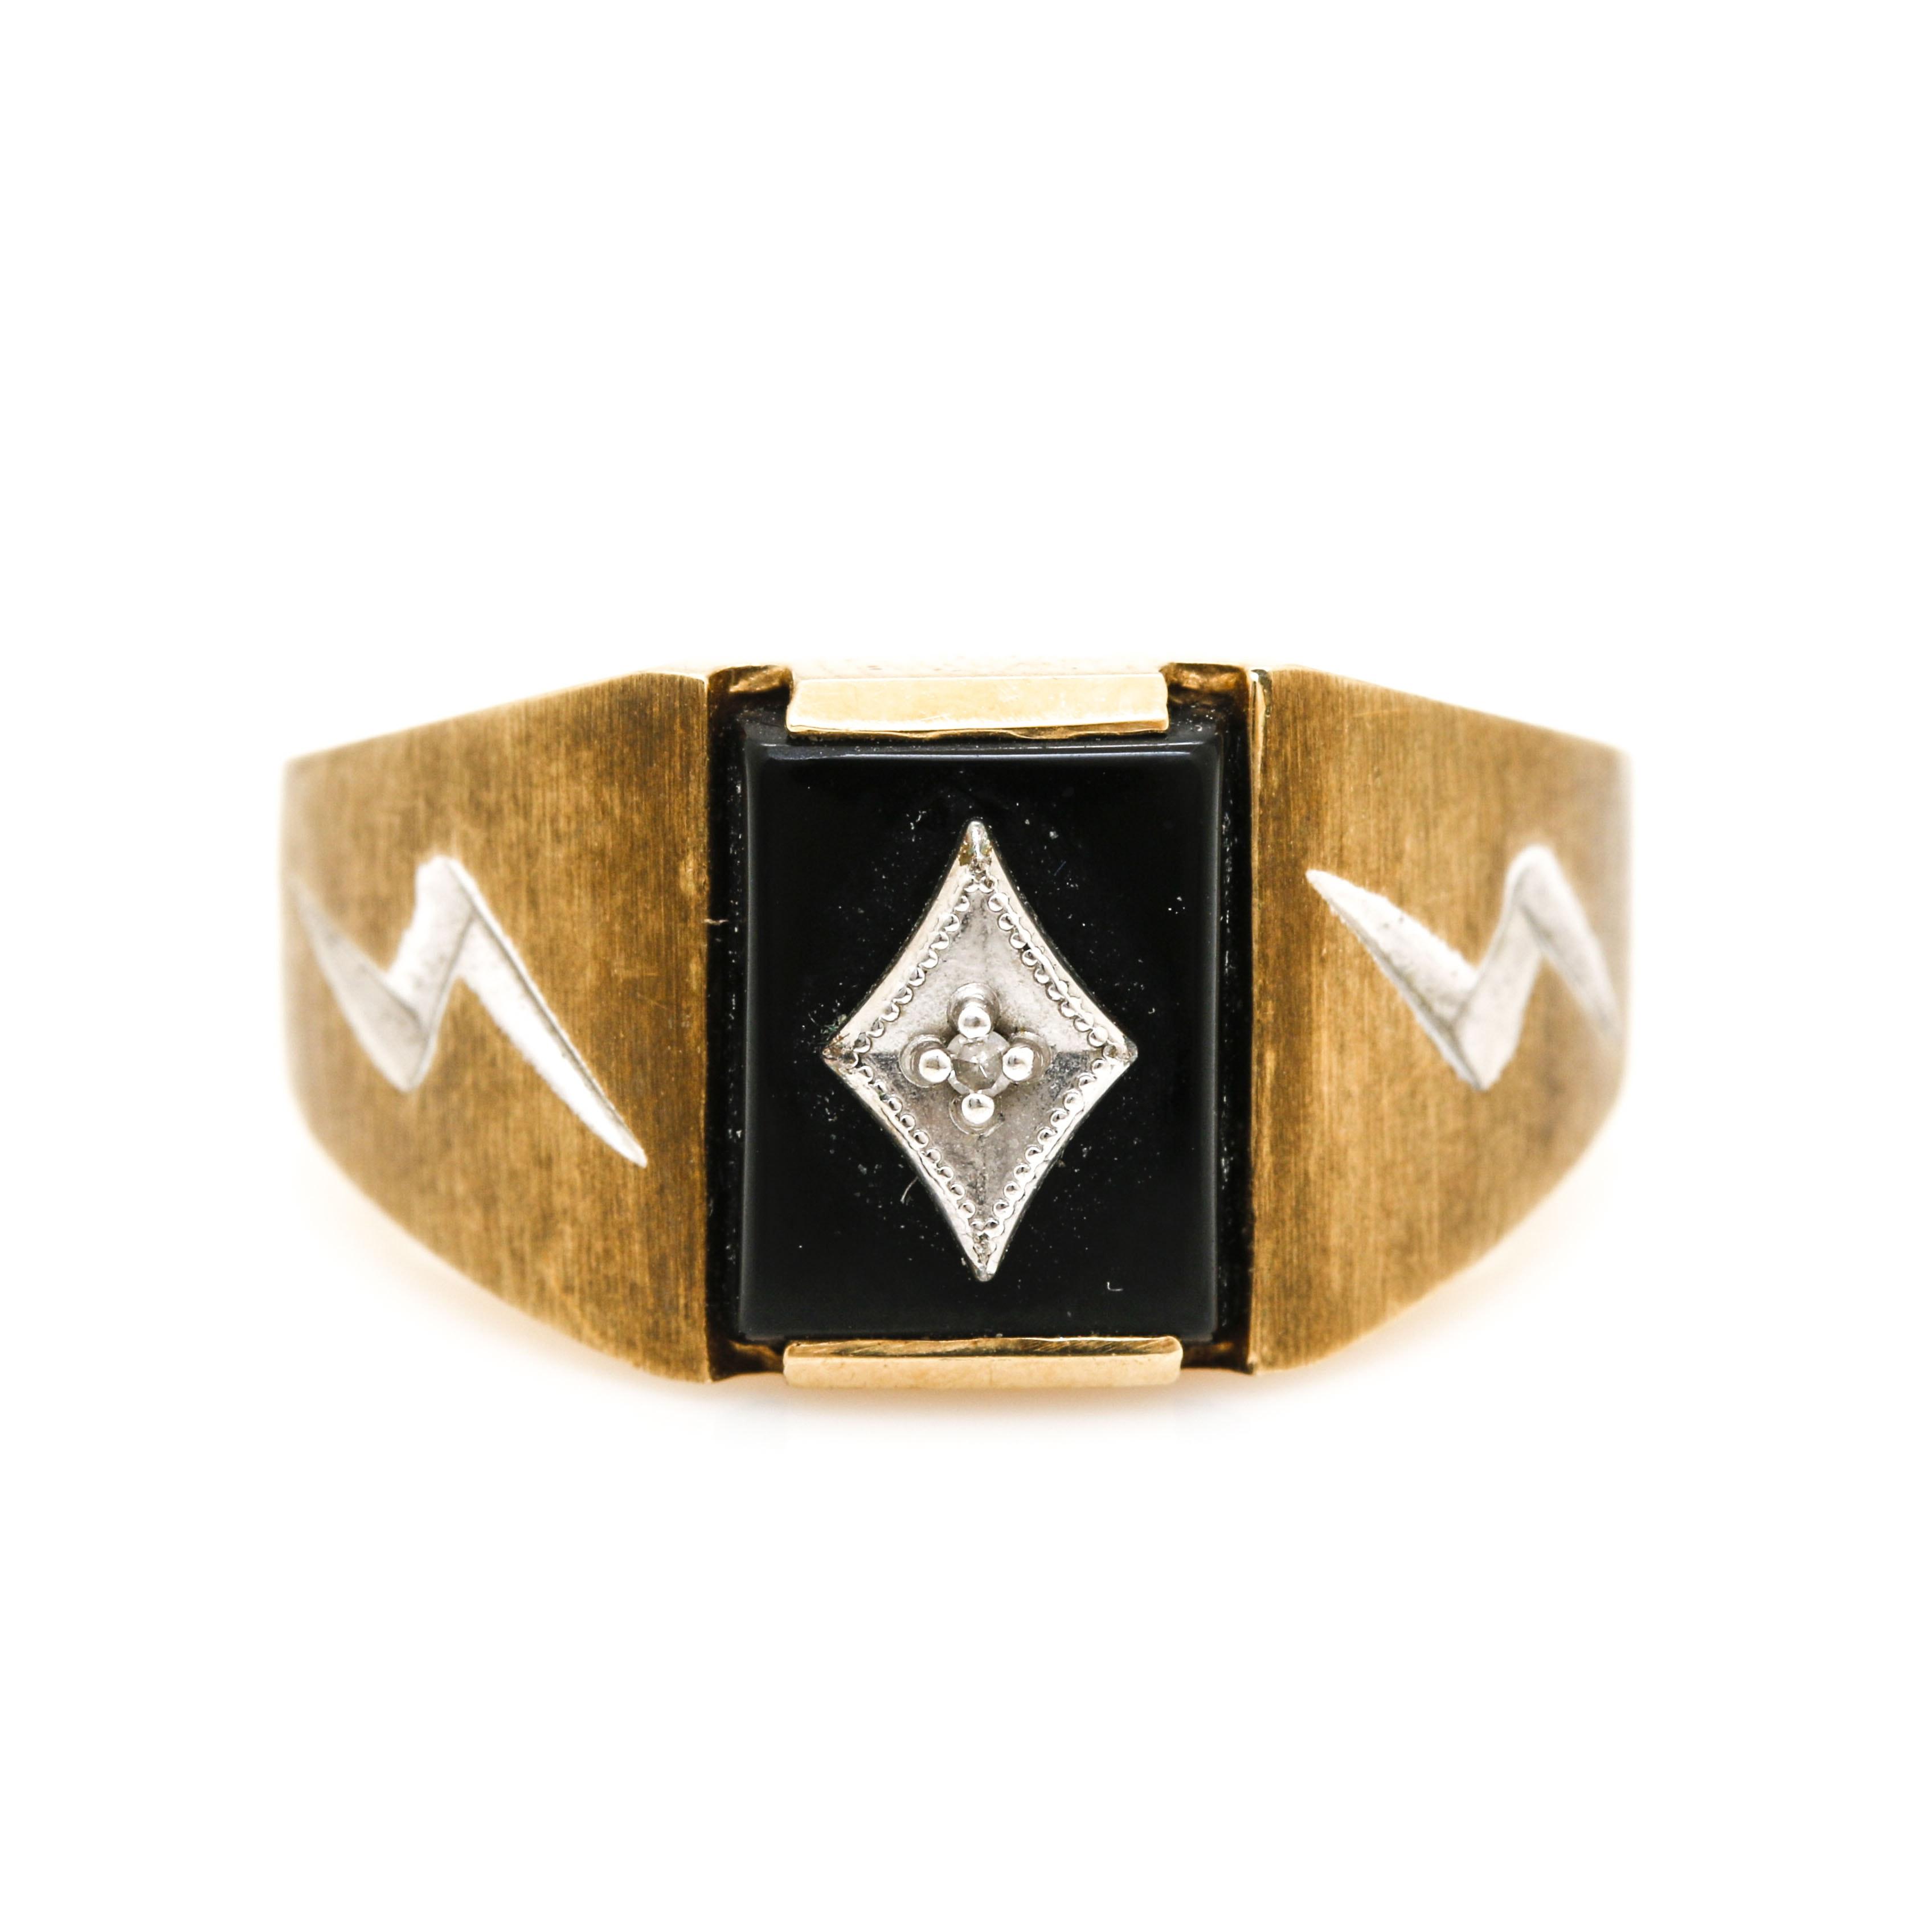 10K Yellow Gold Onyx and Diamond Ring